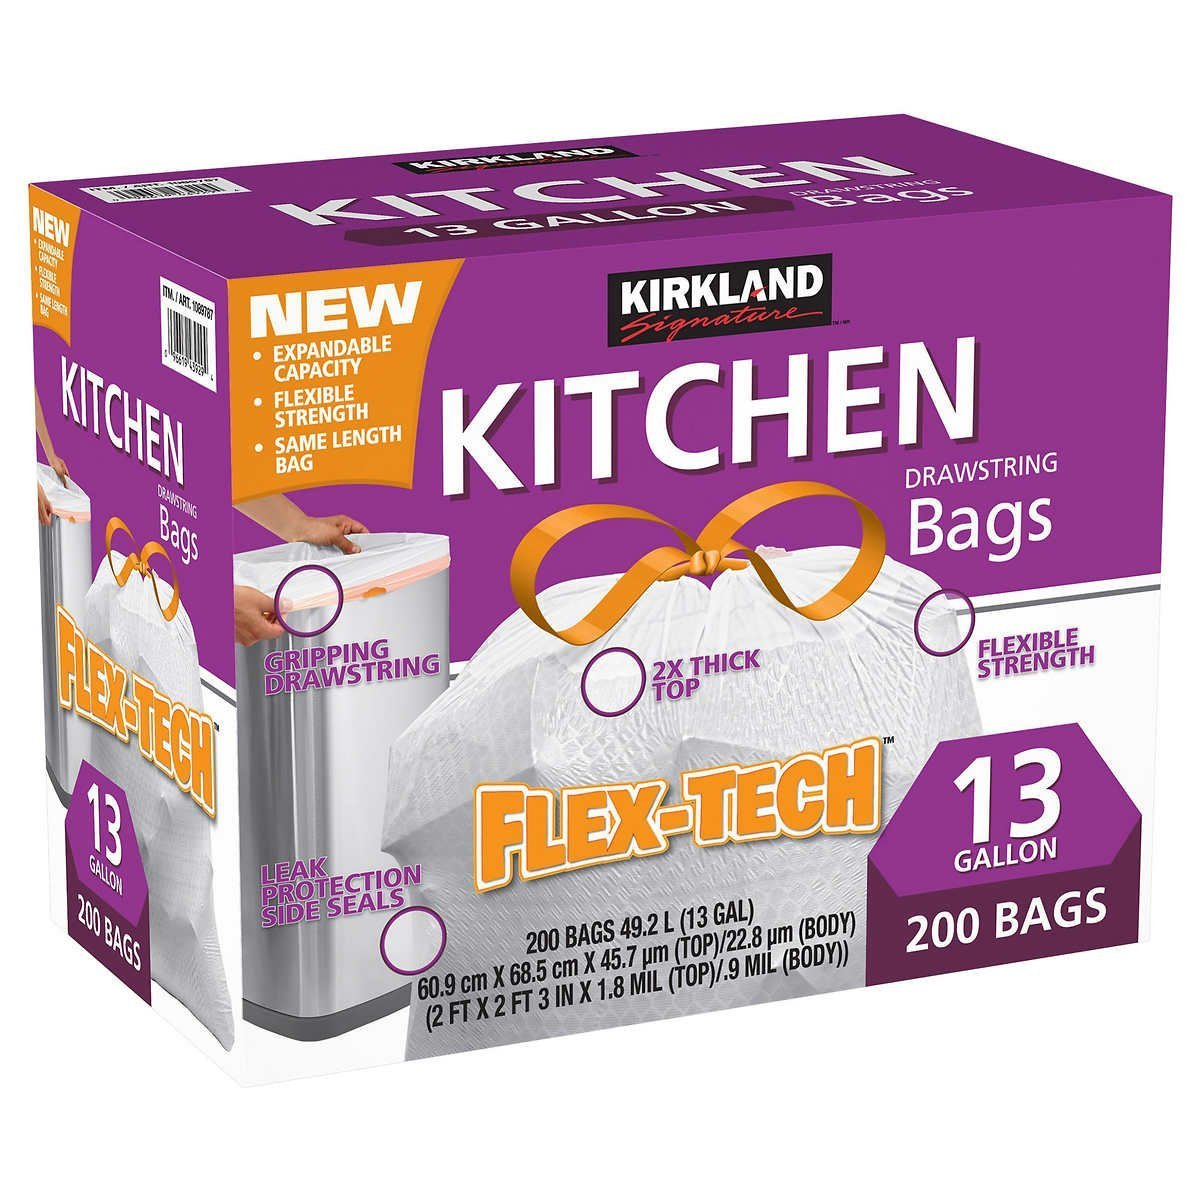 Kirkland Signature Drawstring Kitchen Trash Bags - 13 Gallon - 200 Count (2 Cases of 200)